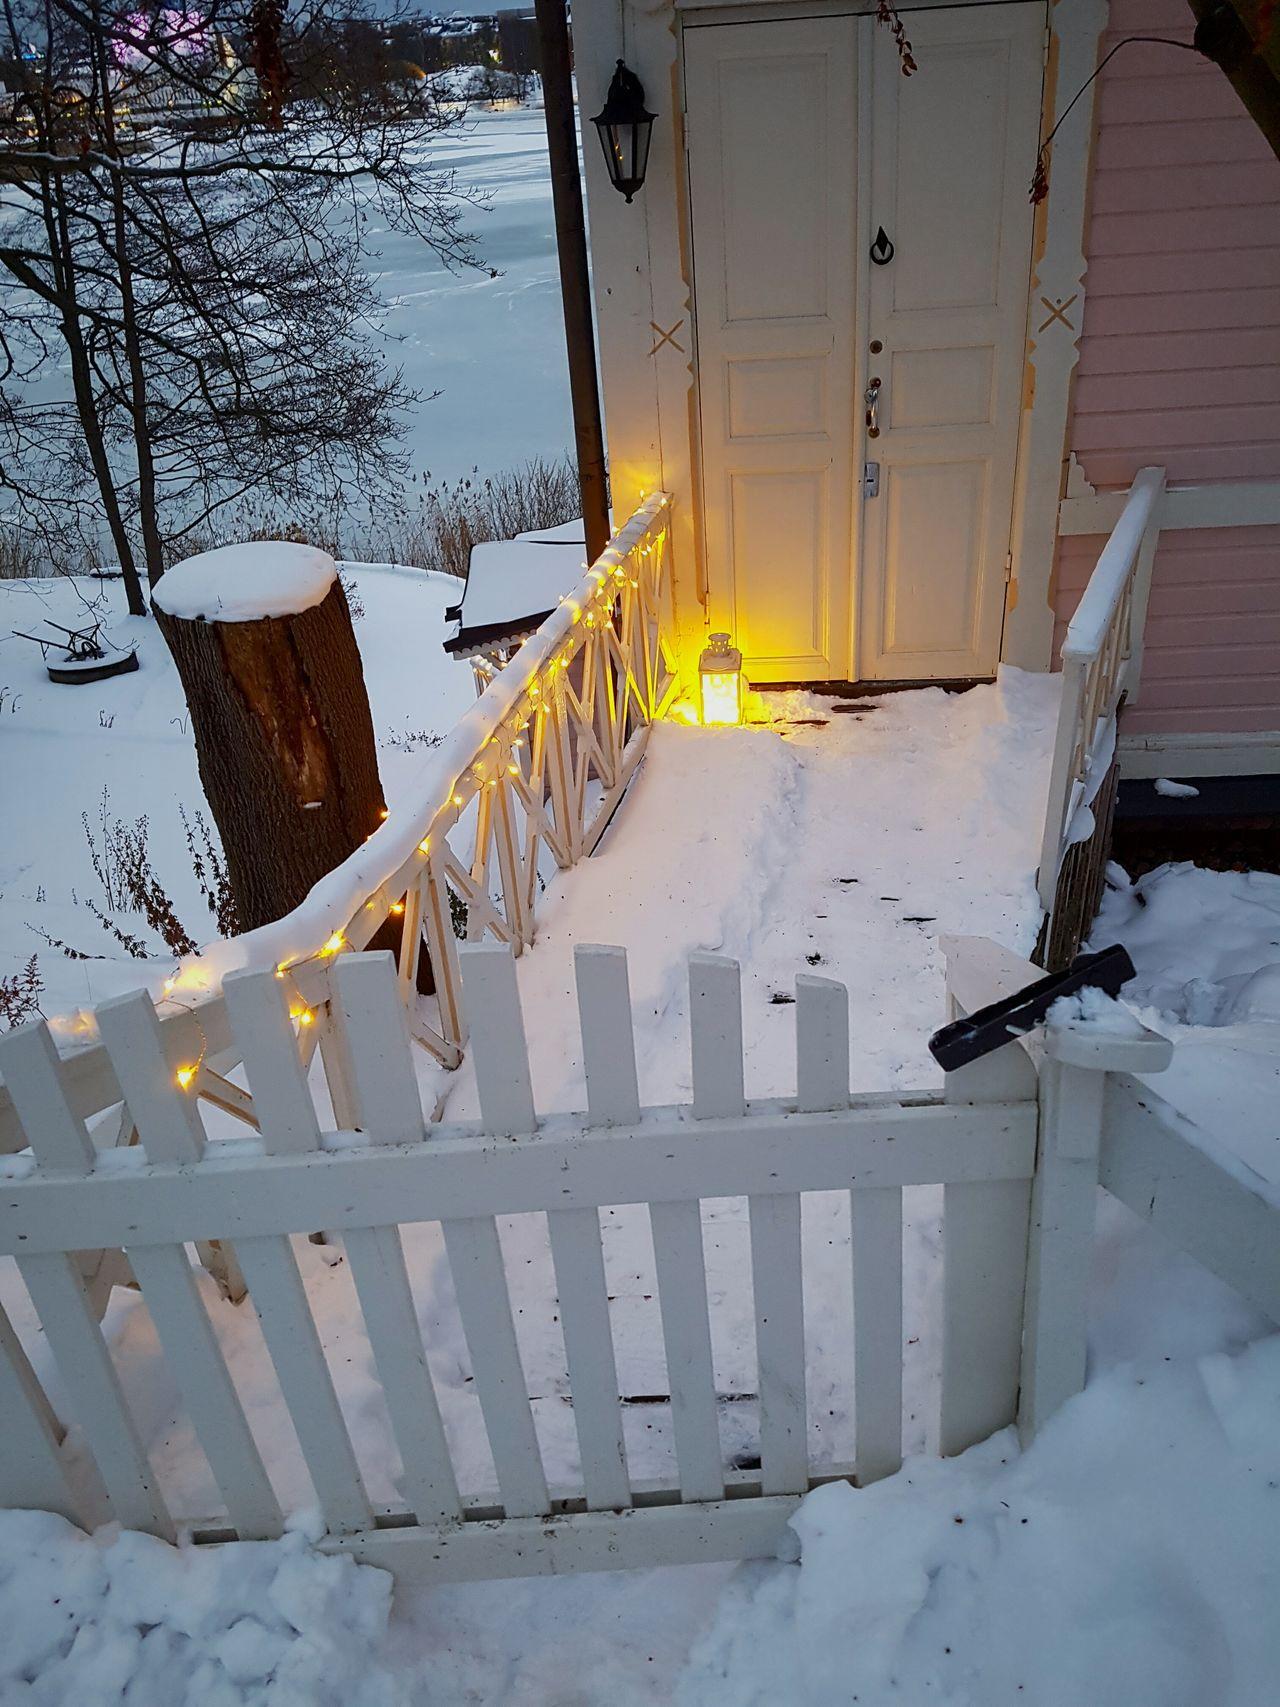 Snow Winter Helsinki Finland Evening Lights And Snow Cute Winter Wonderland ❄ Töölönlahti House Christmas Christmas Lights House By Lake